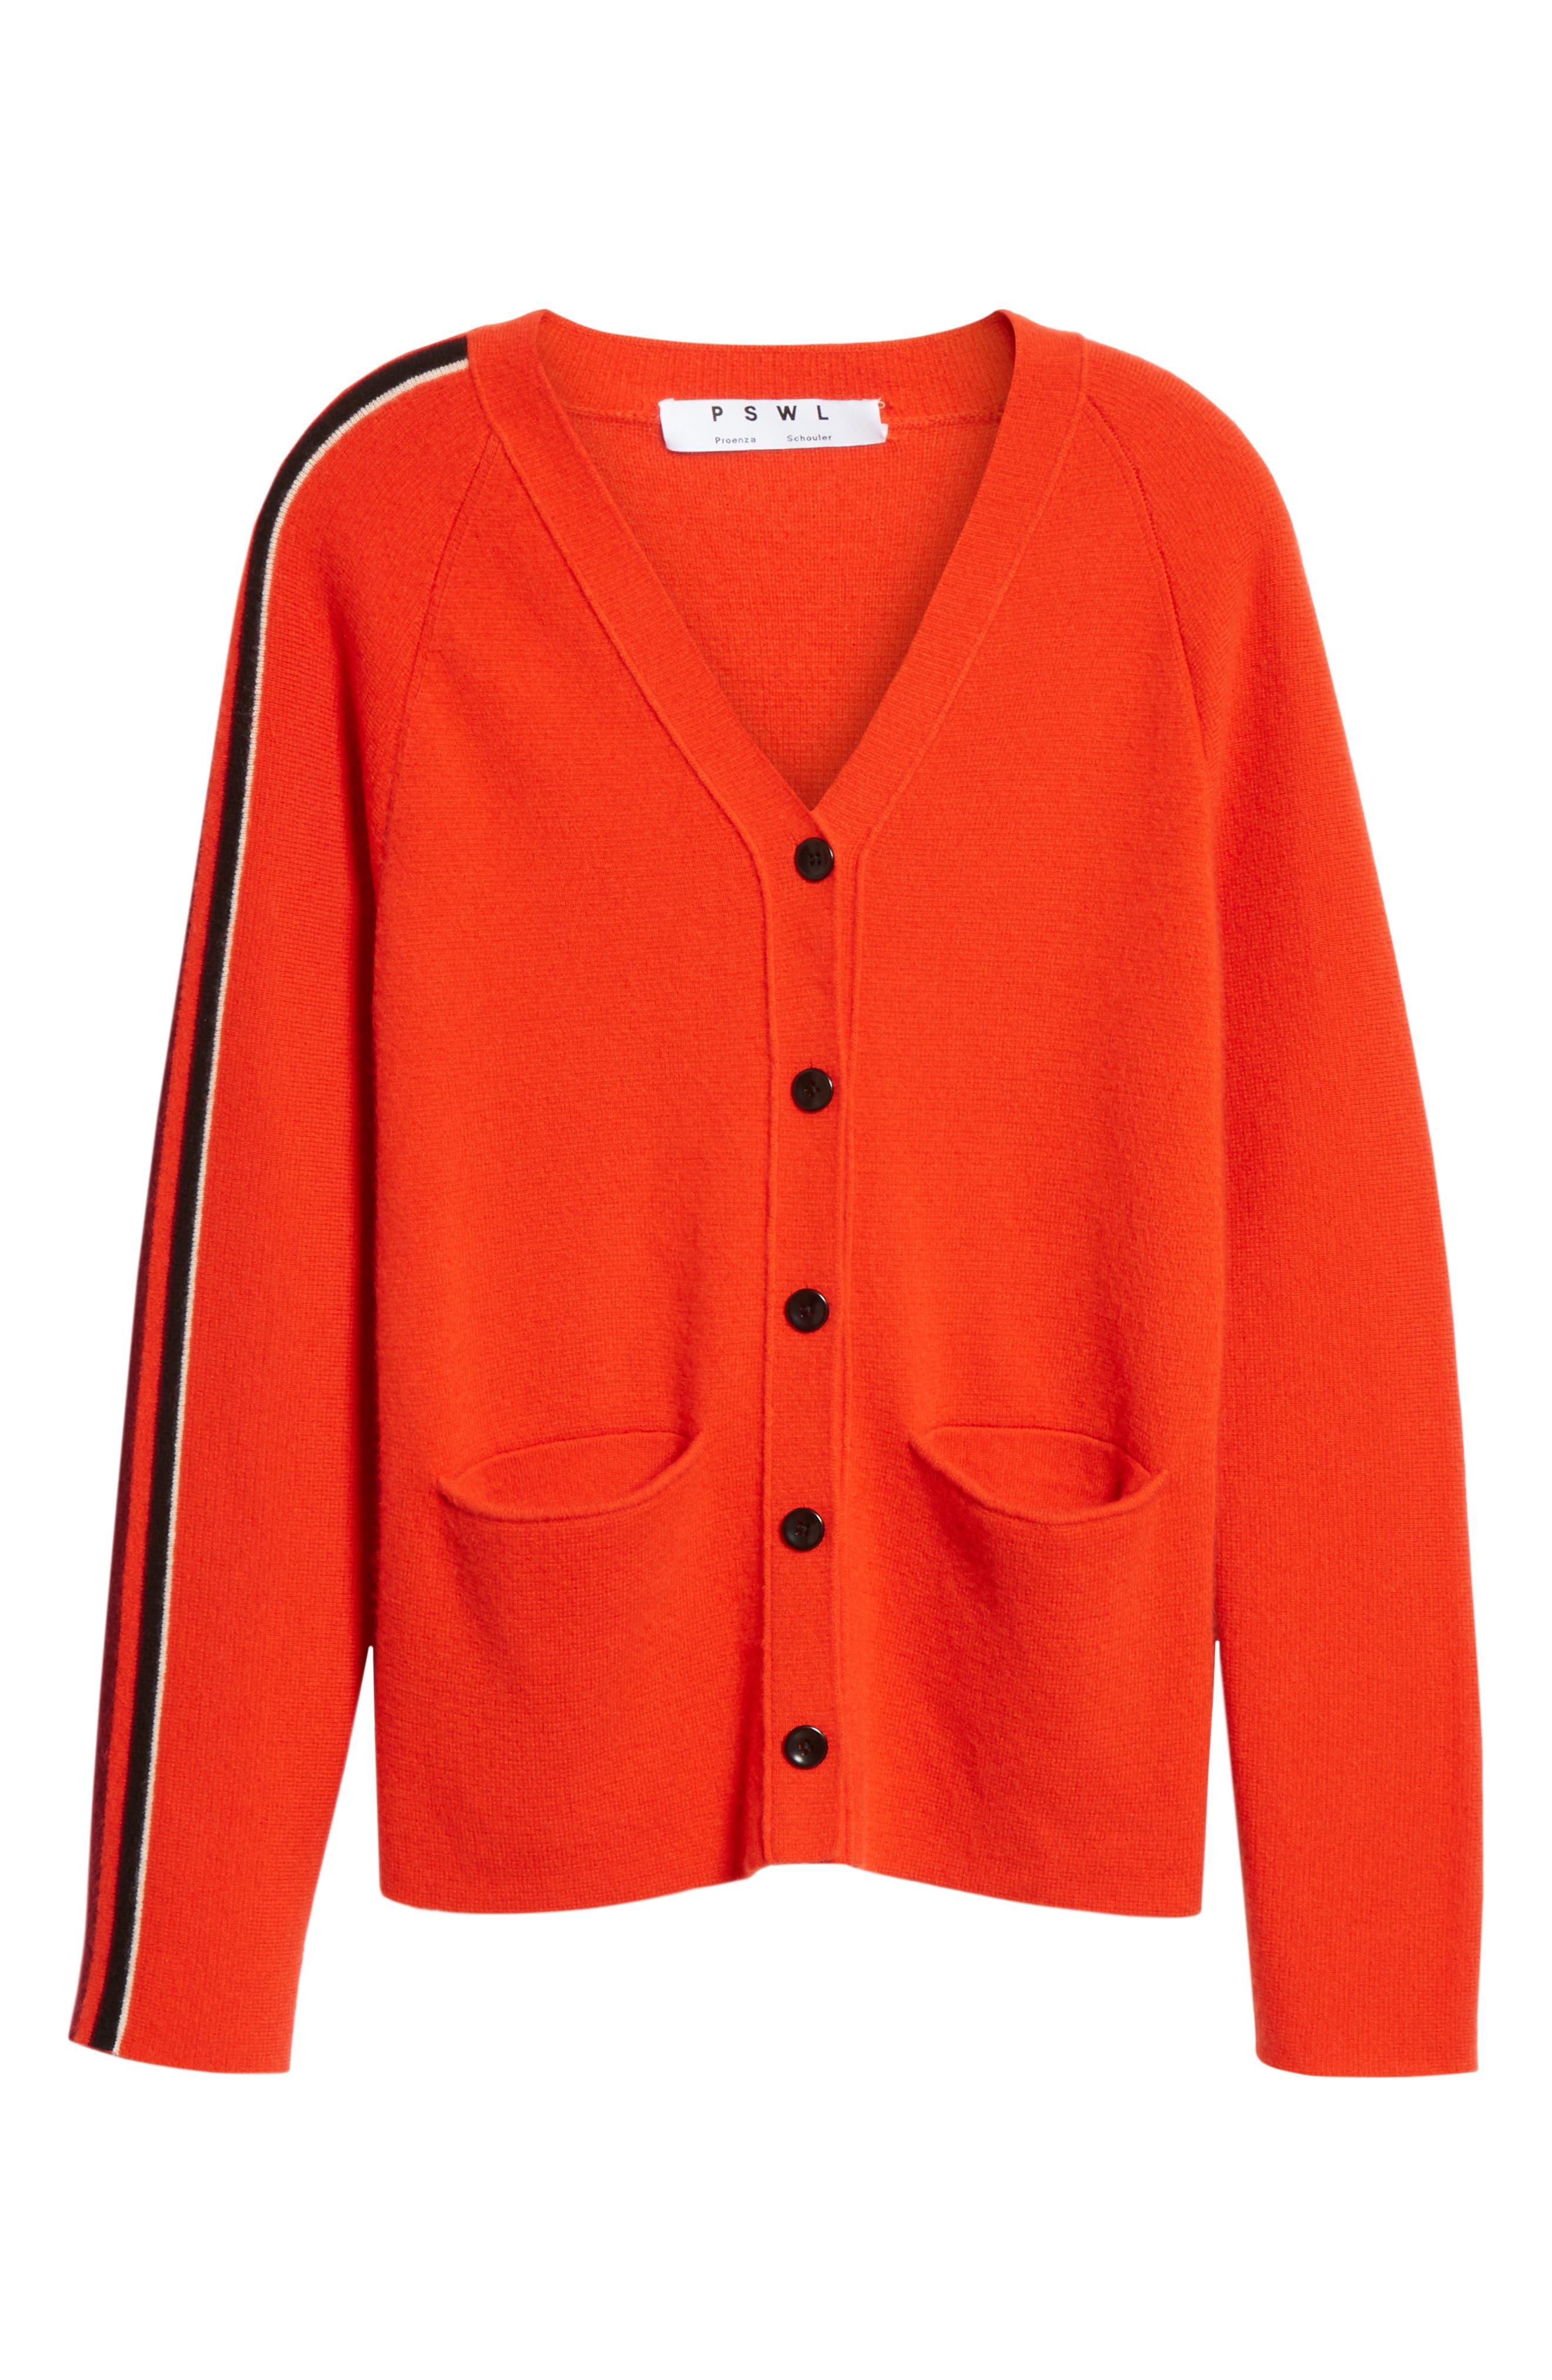 PSWL Stripe Sleeve Merino Wool & Cashmere Cardigan,                             Alternate thumbnail 6, color,                             RED COMBO